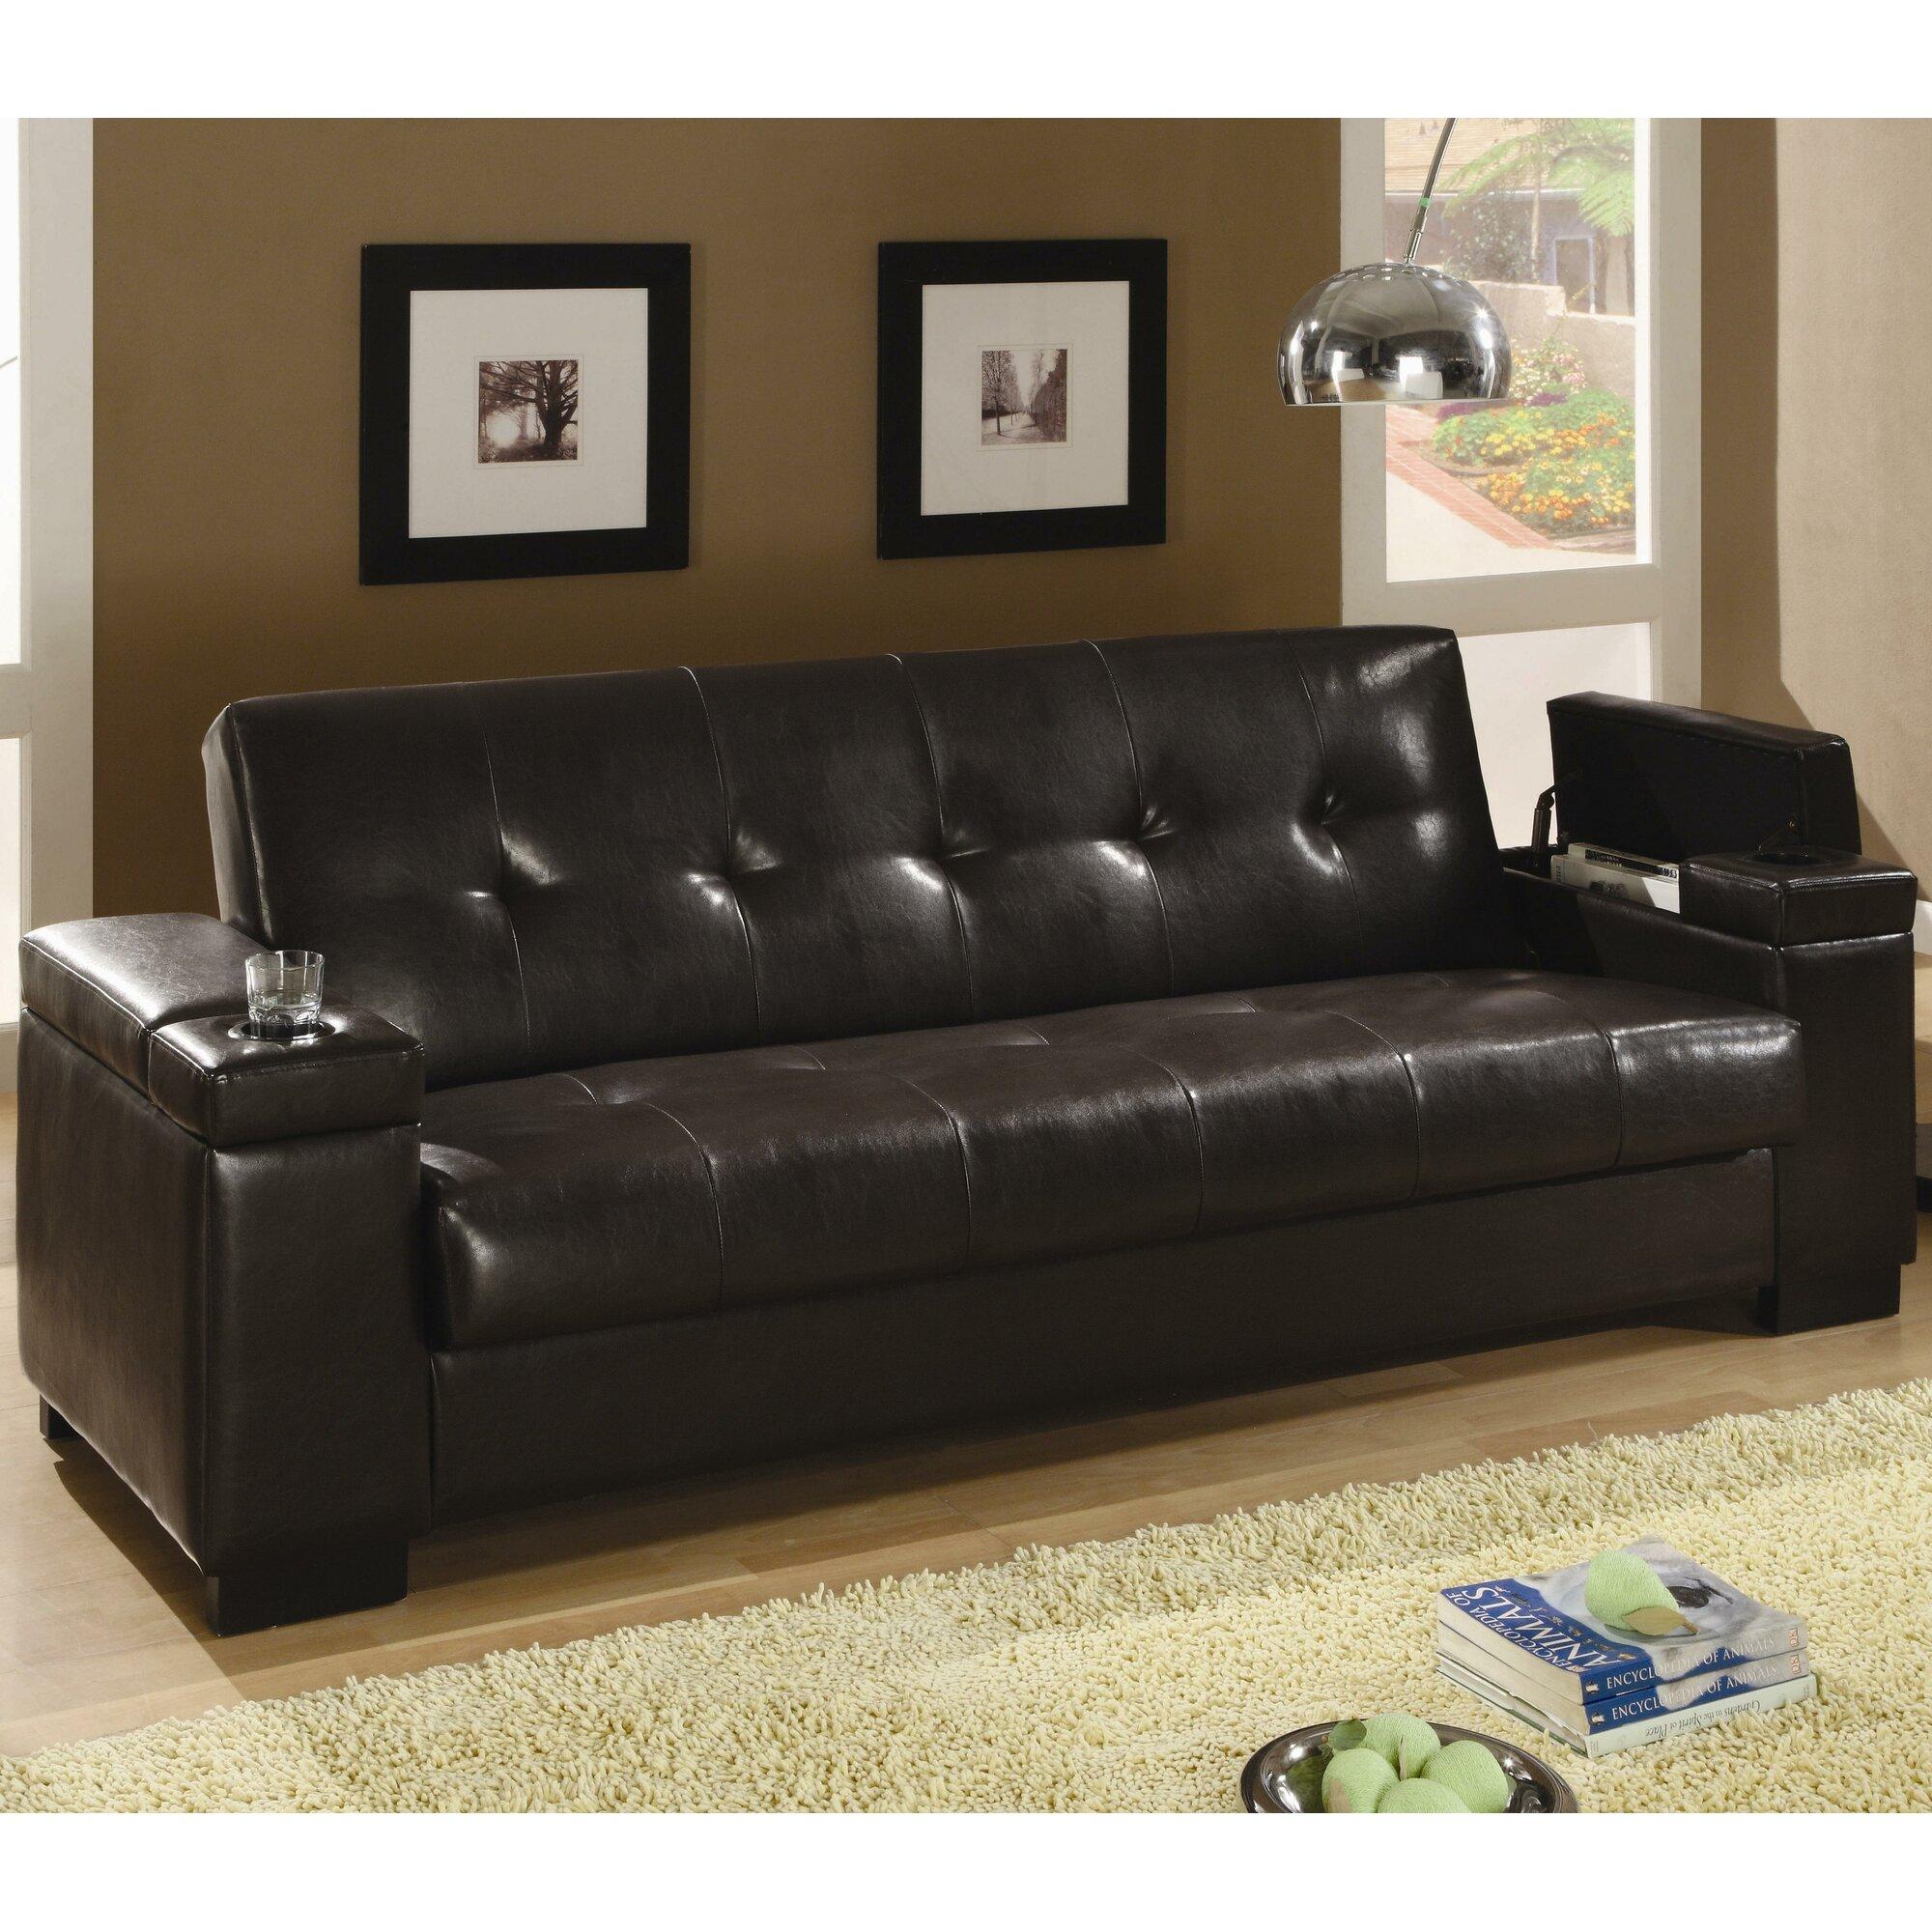 Wildon Home  San Diego Sleeper Sofa  Reviews Wayfair - Furniture upholstery san diego